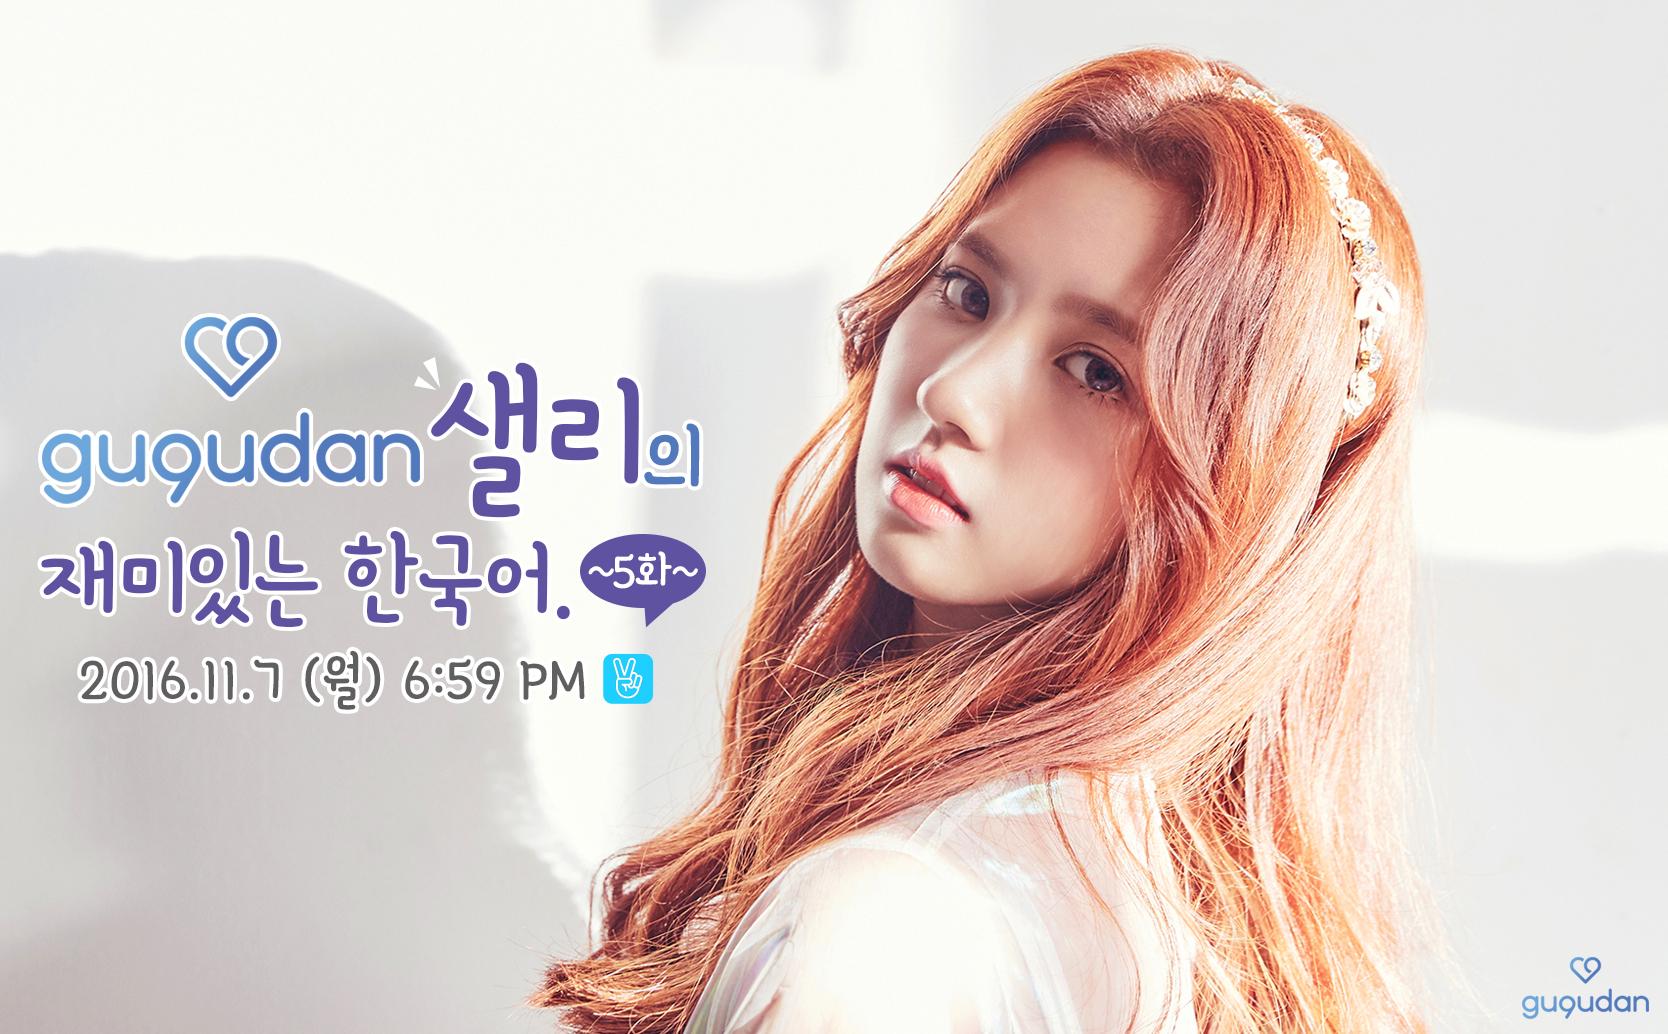 gugudan 샐리의 재미있는 한국어. ~5화~